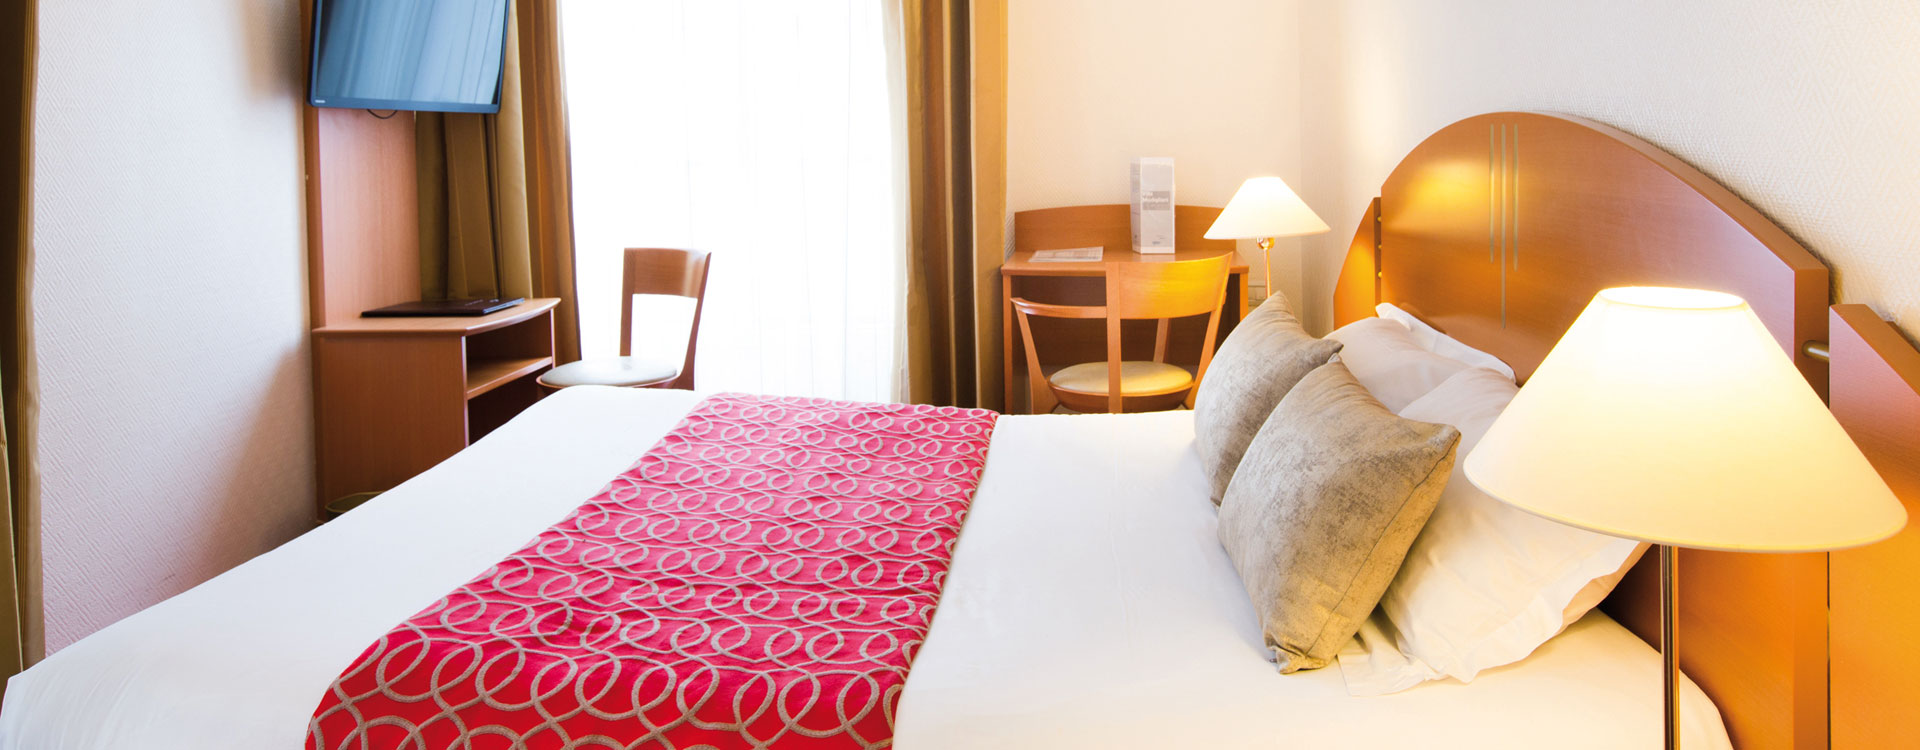 Chambre standard - Hôtel*** Paris La Villa Modigliani